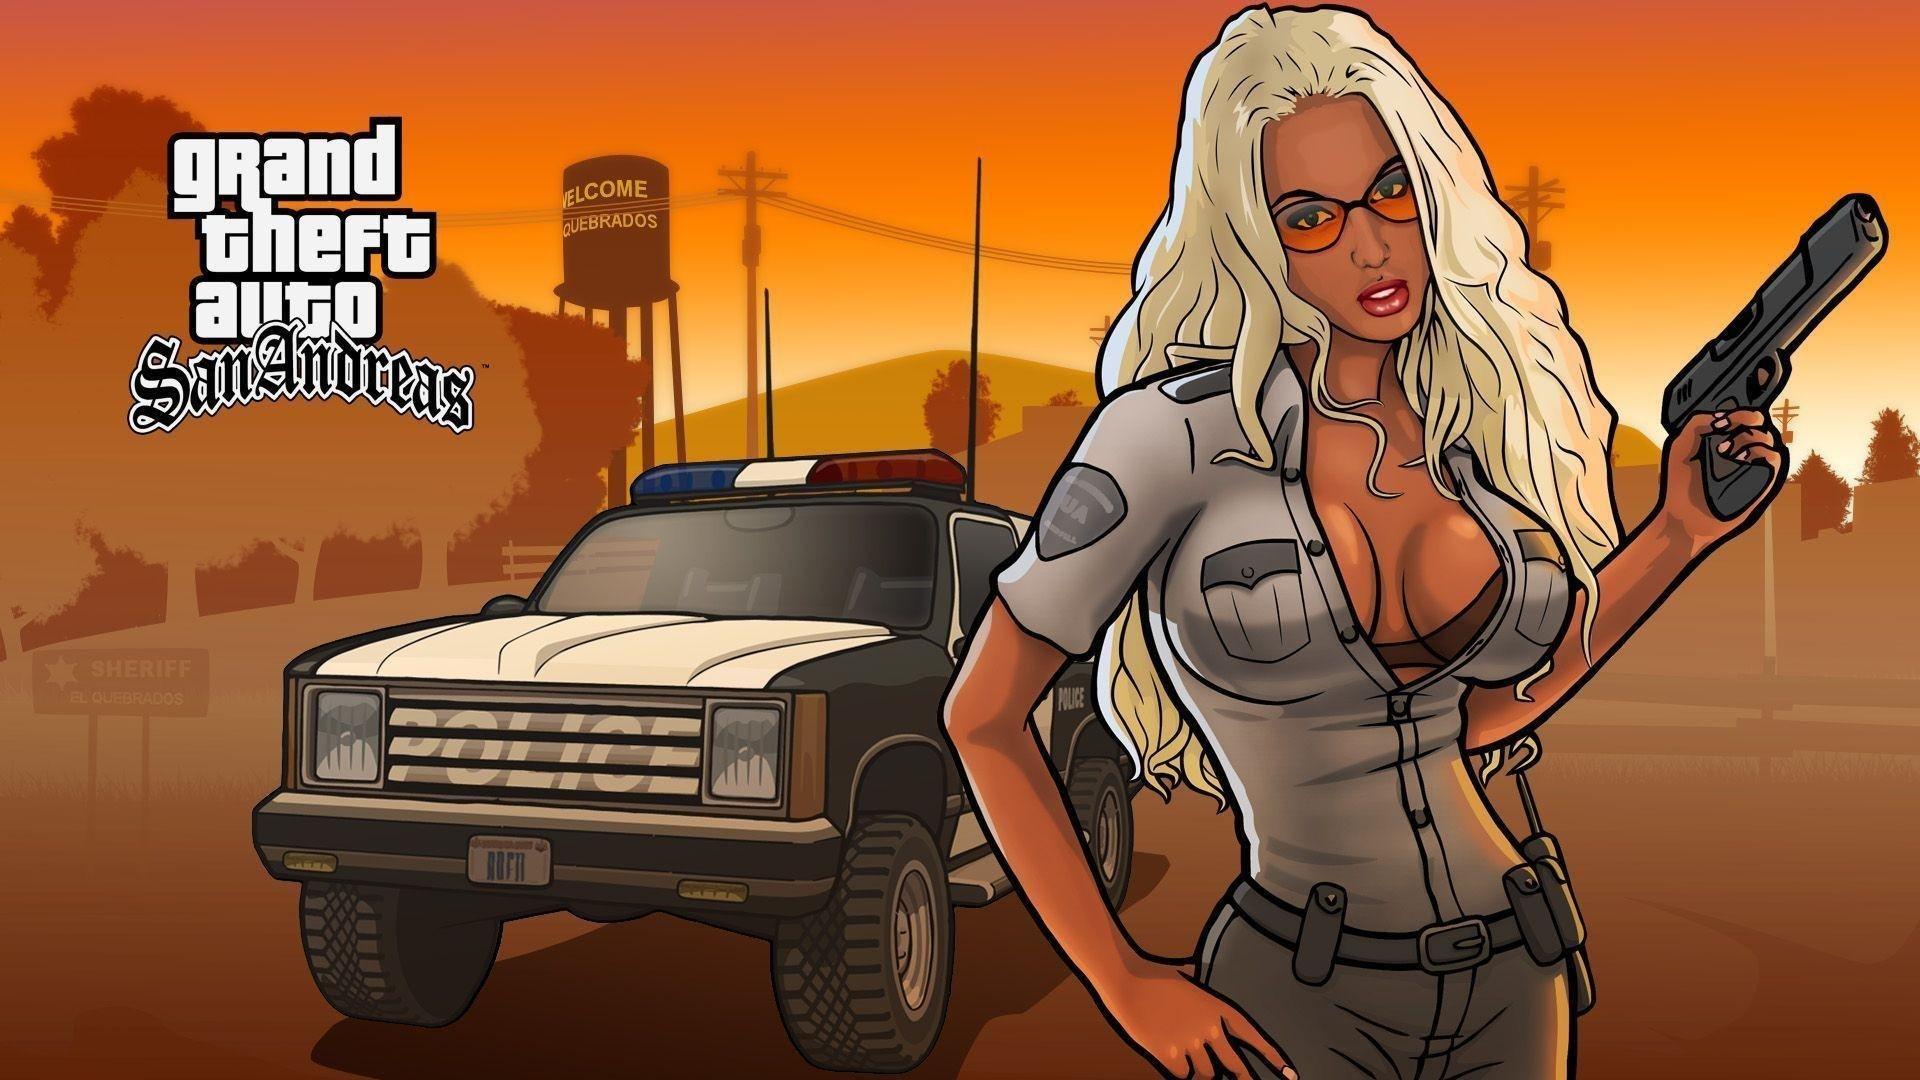 Grand Theft Auto San Andreas Gta Sa Wallpapers Hd For Desktop